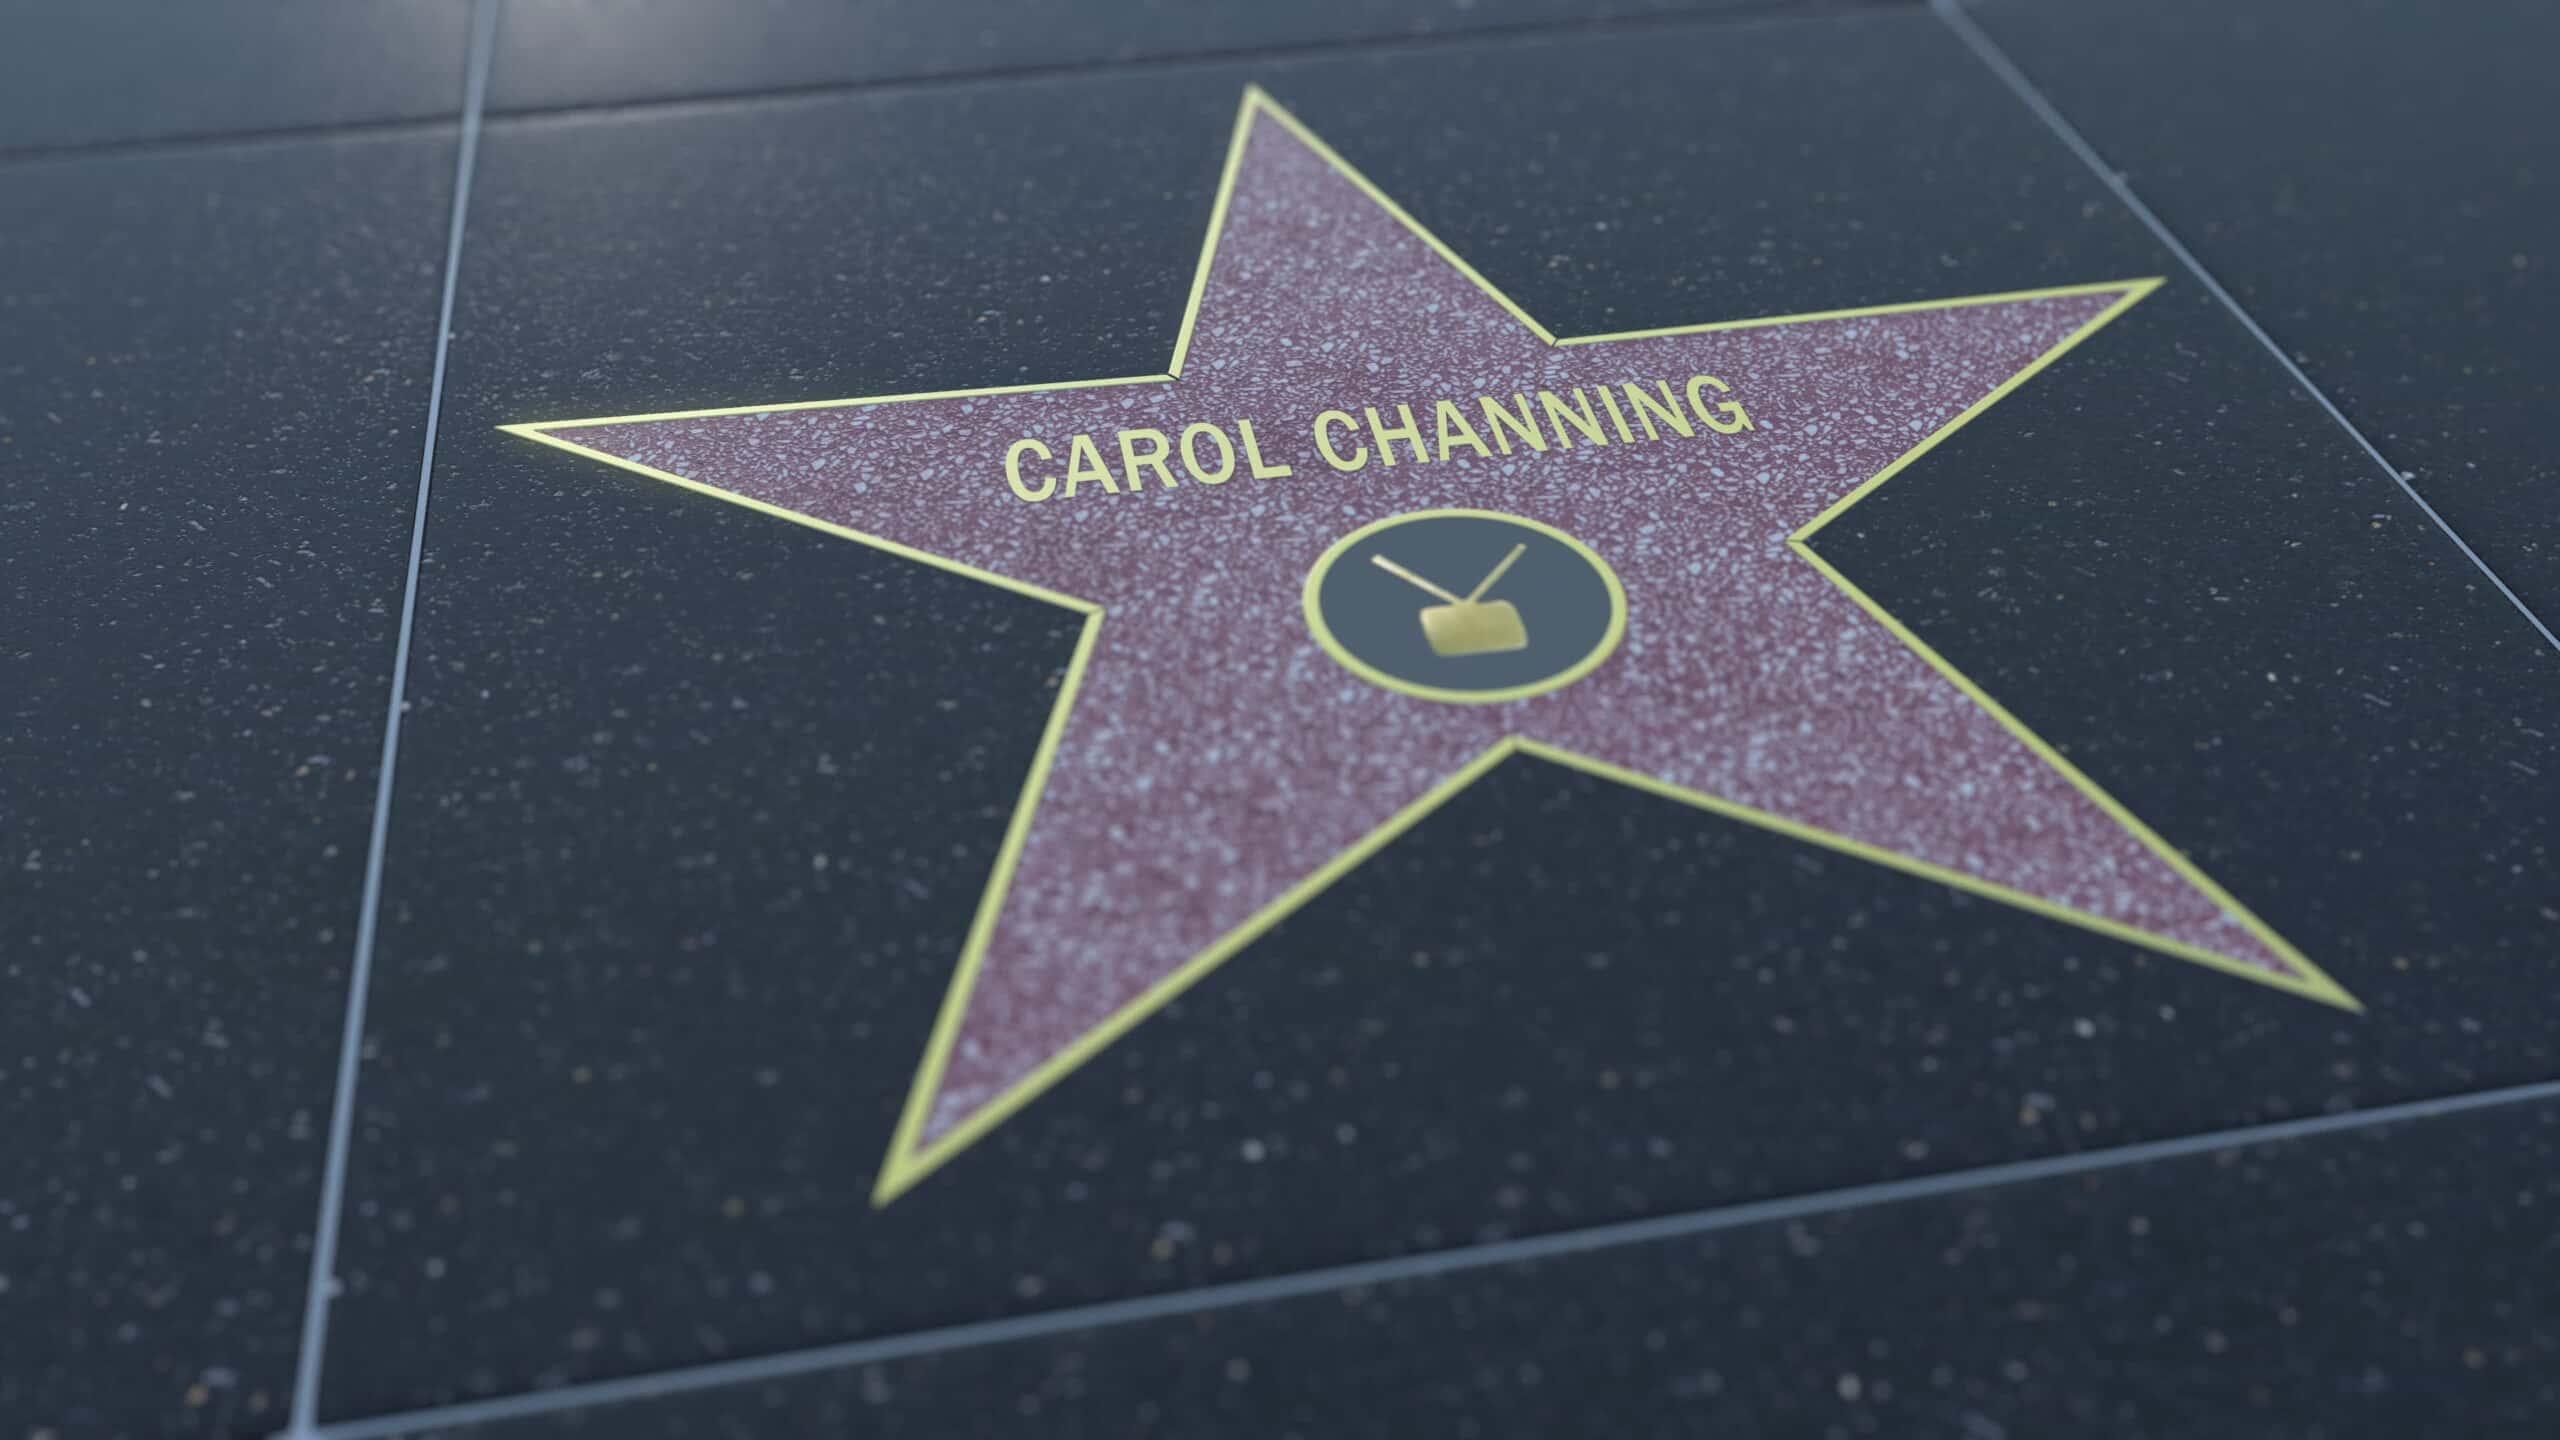 Carol Channing facts